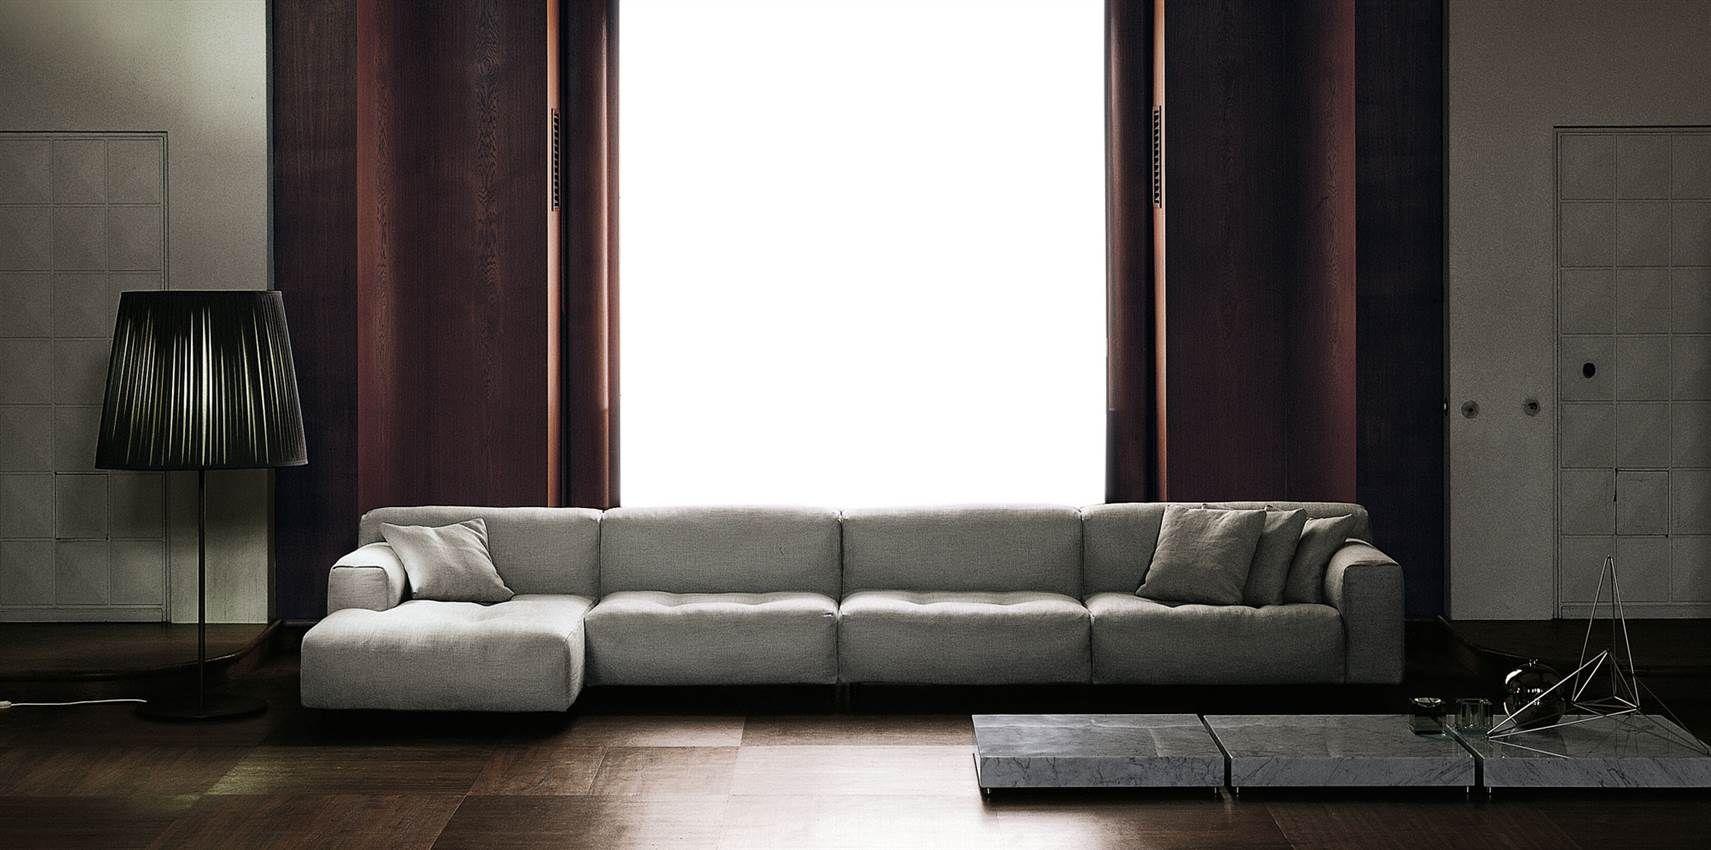 Softwall   Divani   Prodotti   Living Divani by the same designer ...